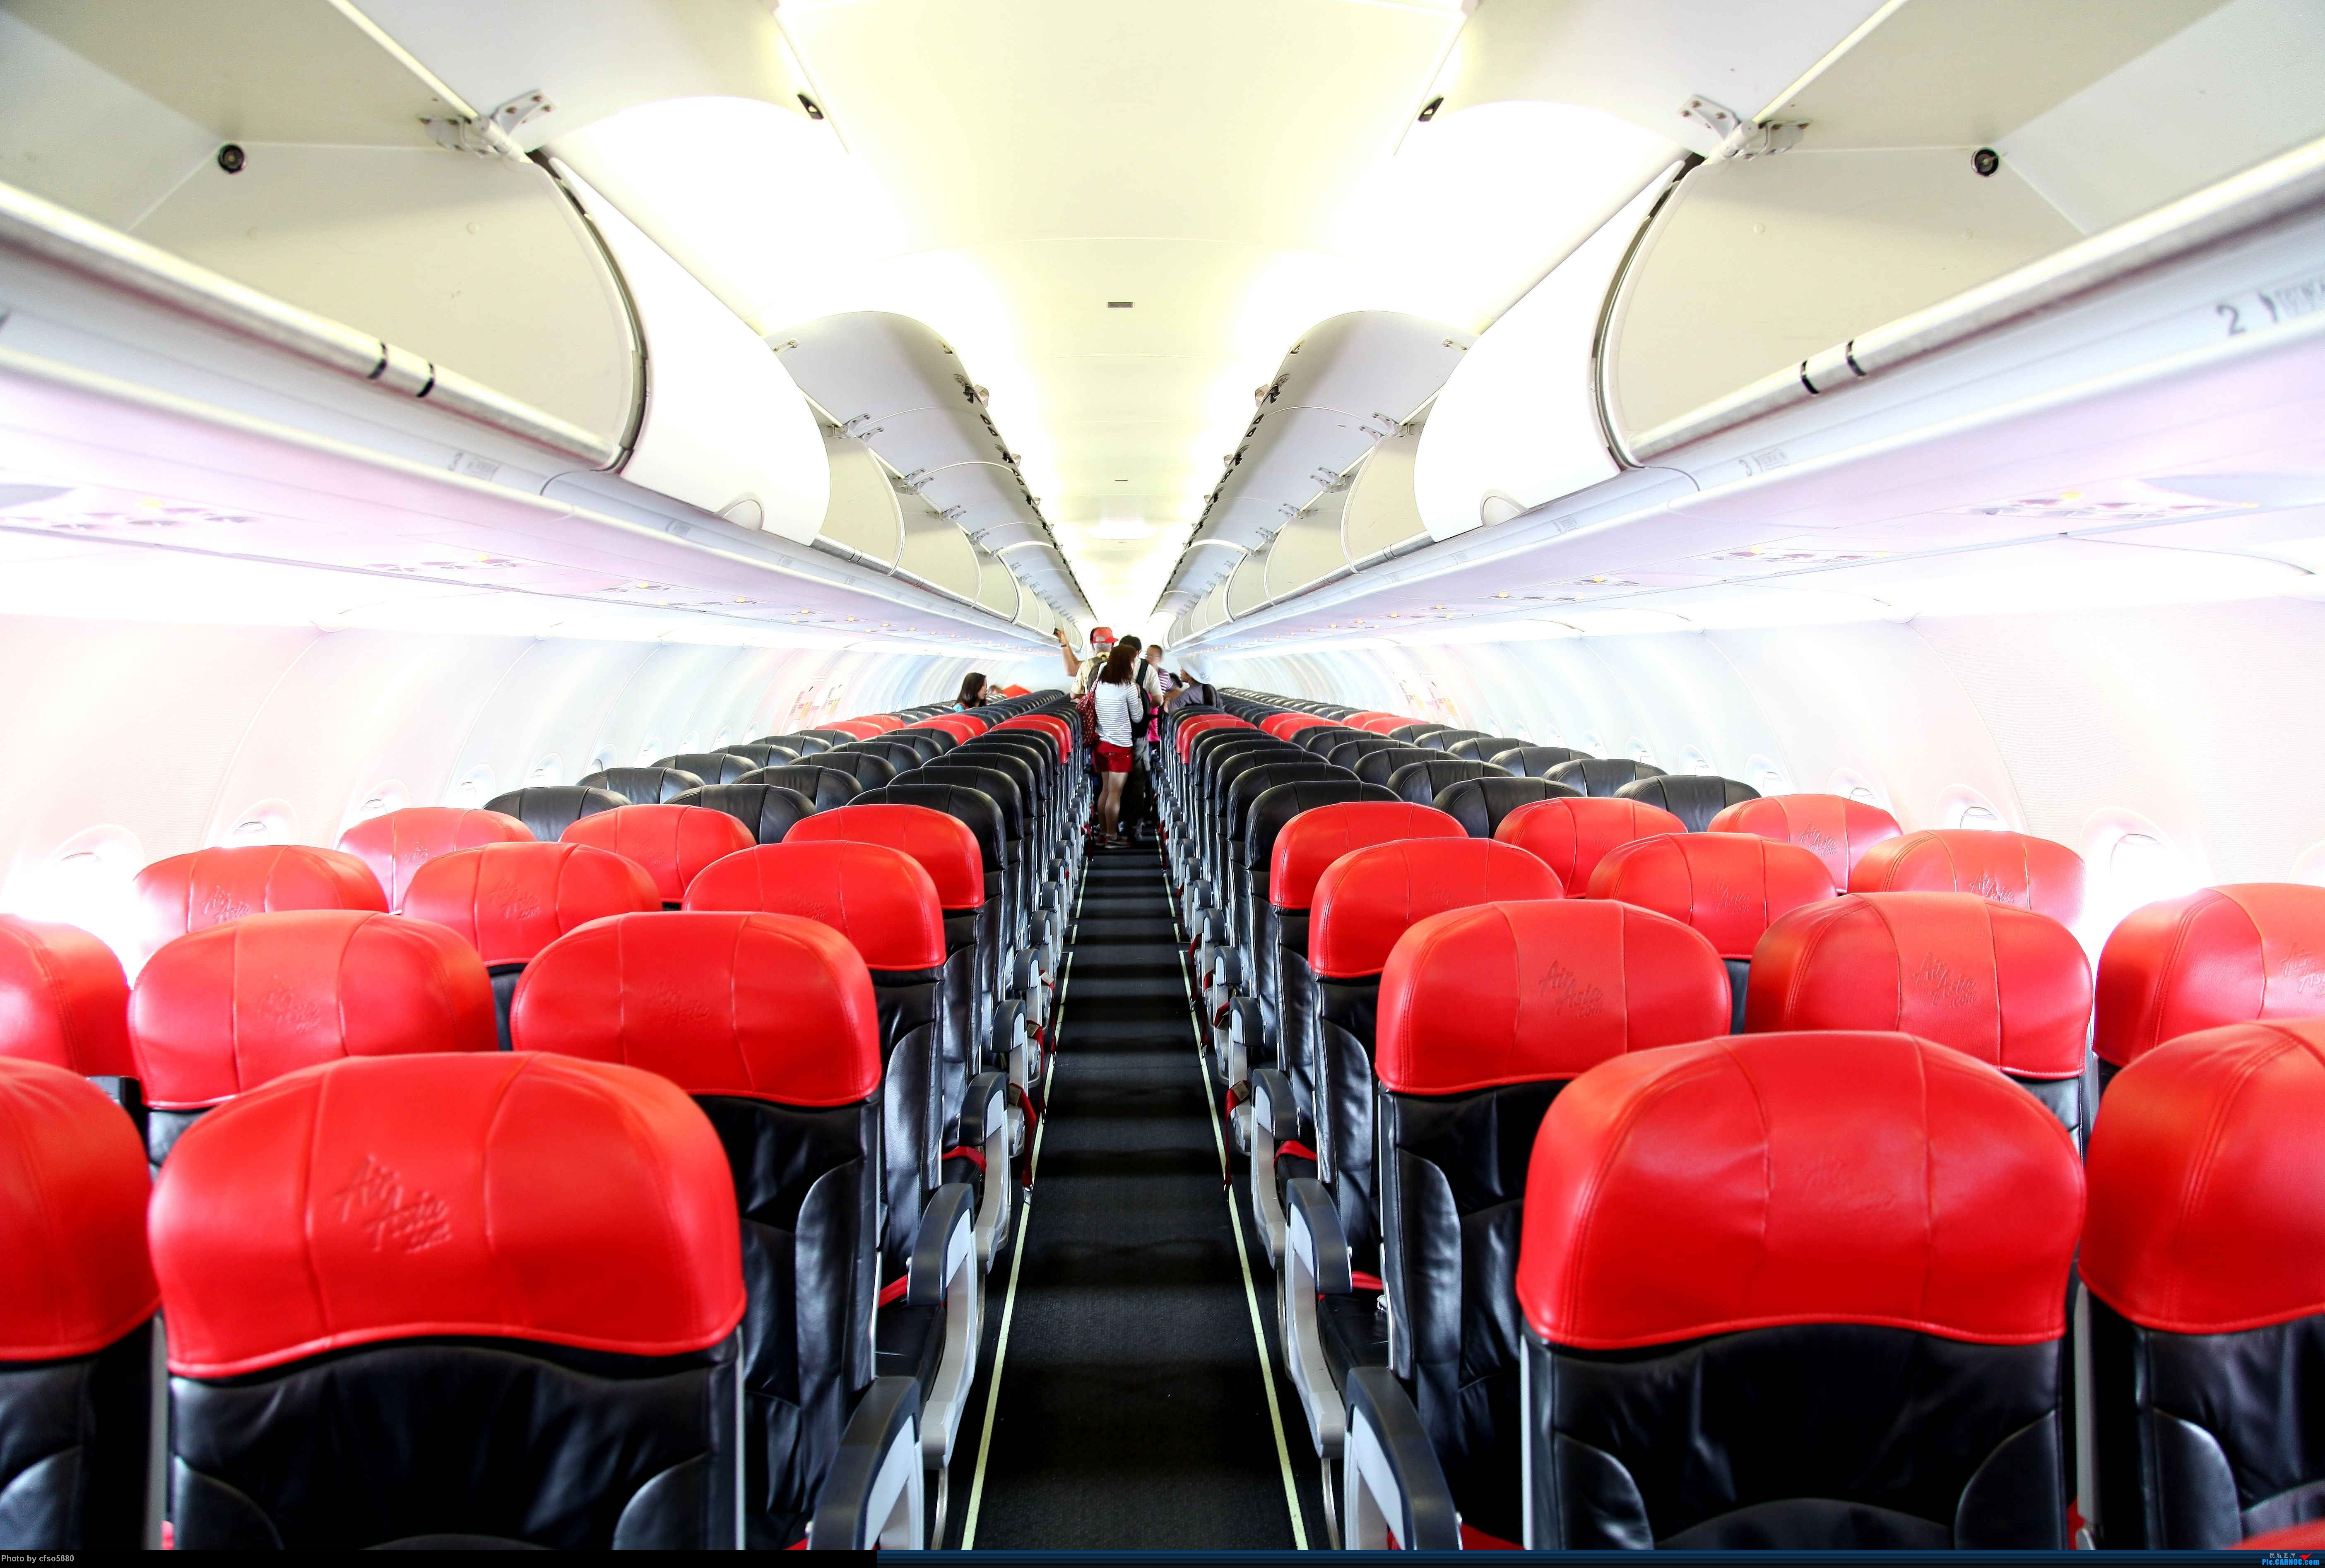 Re:[原创]2013大马拍机之旅,有彩绘、有380,飞机多多,惊喜多多。 AIRBUS A320-200